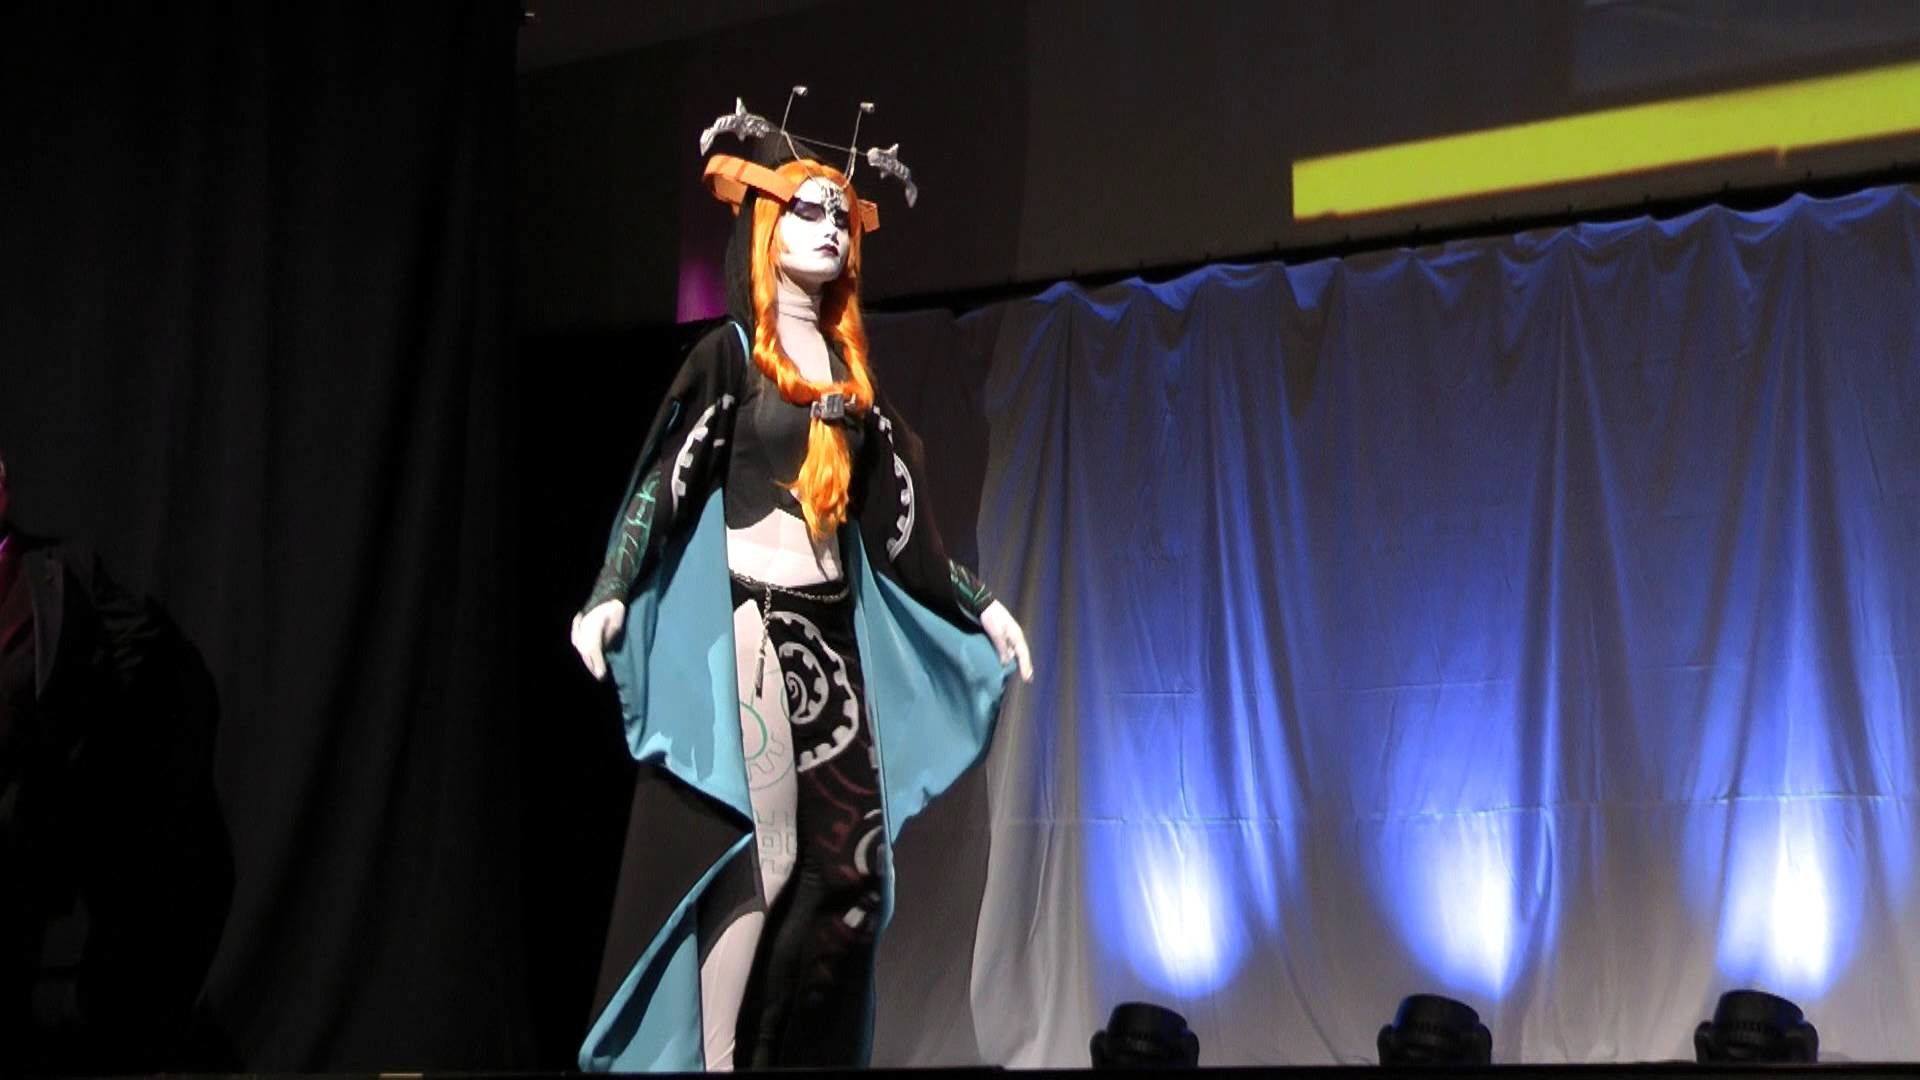 Wondercon 2013 Masquerade – Midna from The Legend of Zelda: Twilight  Princess – YouTube